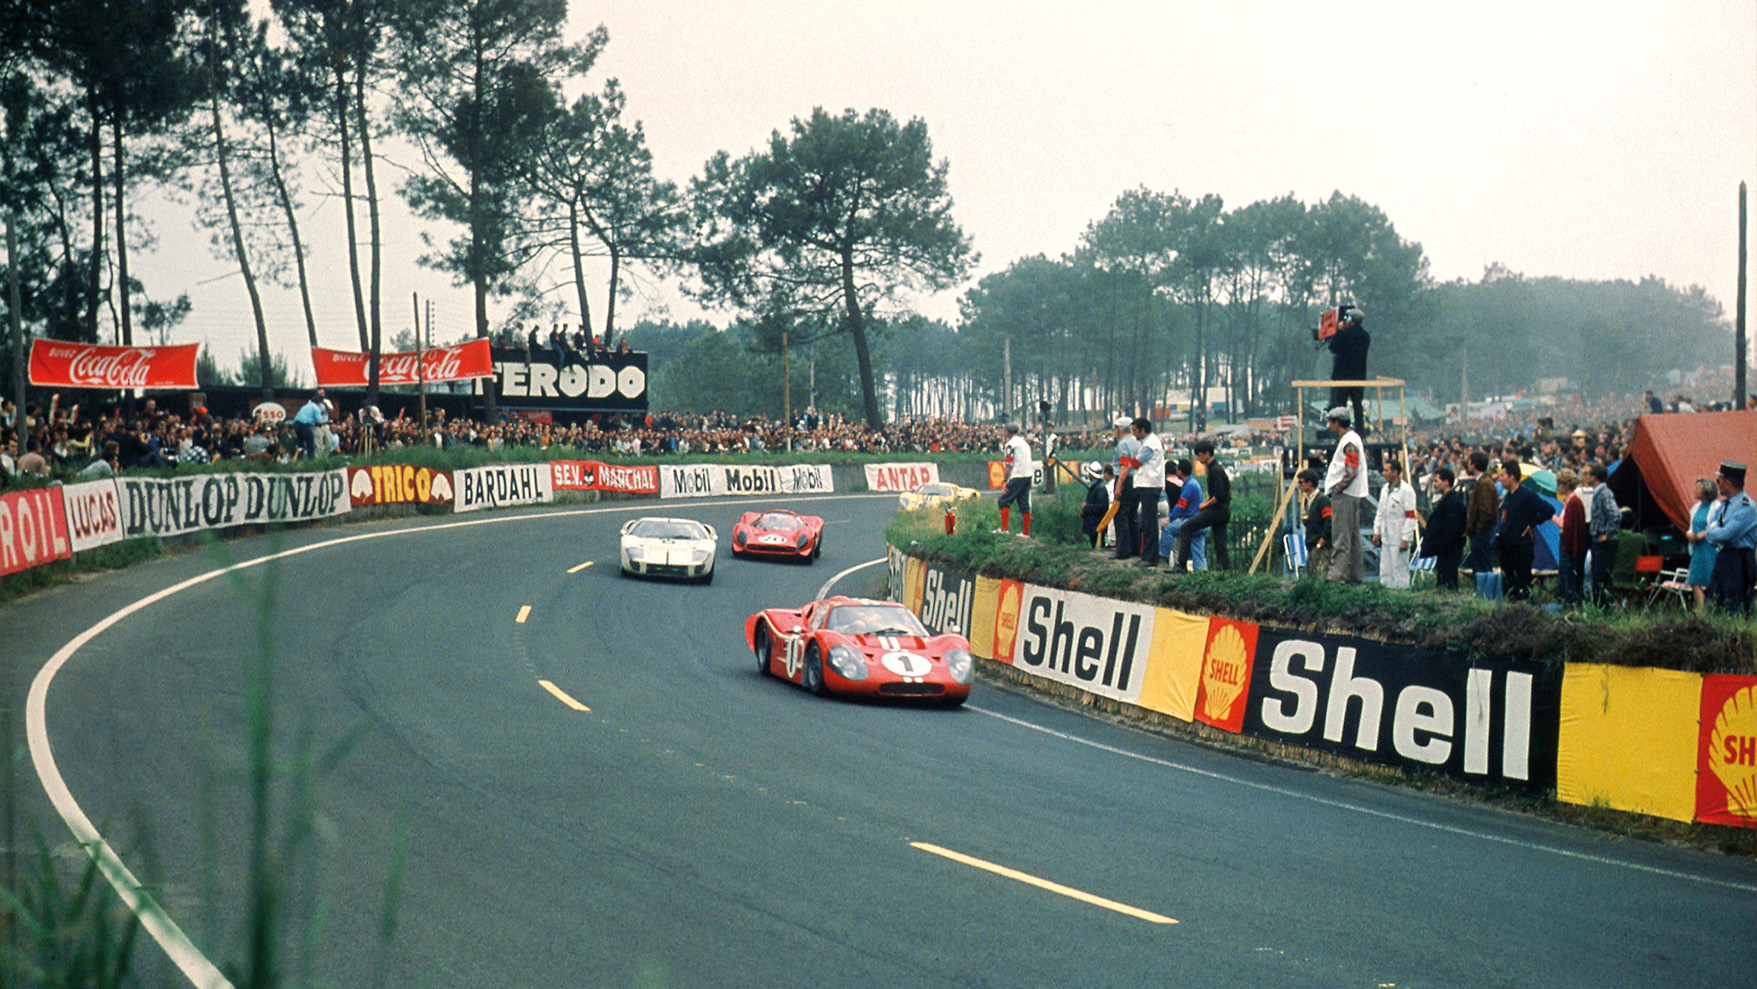 Dan Gurney and AJ Foyt's Ford MkIV leads Chris Amon and Nino Vaccarella's Ferrari 330 P4